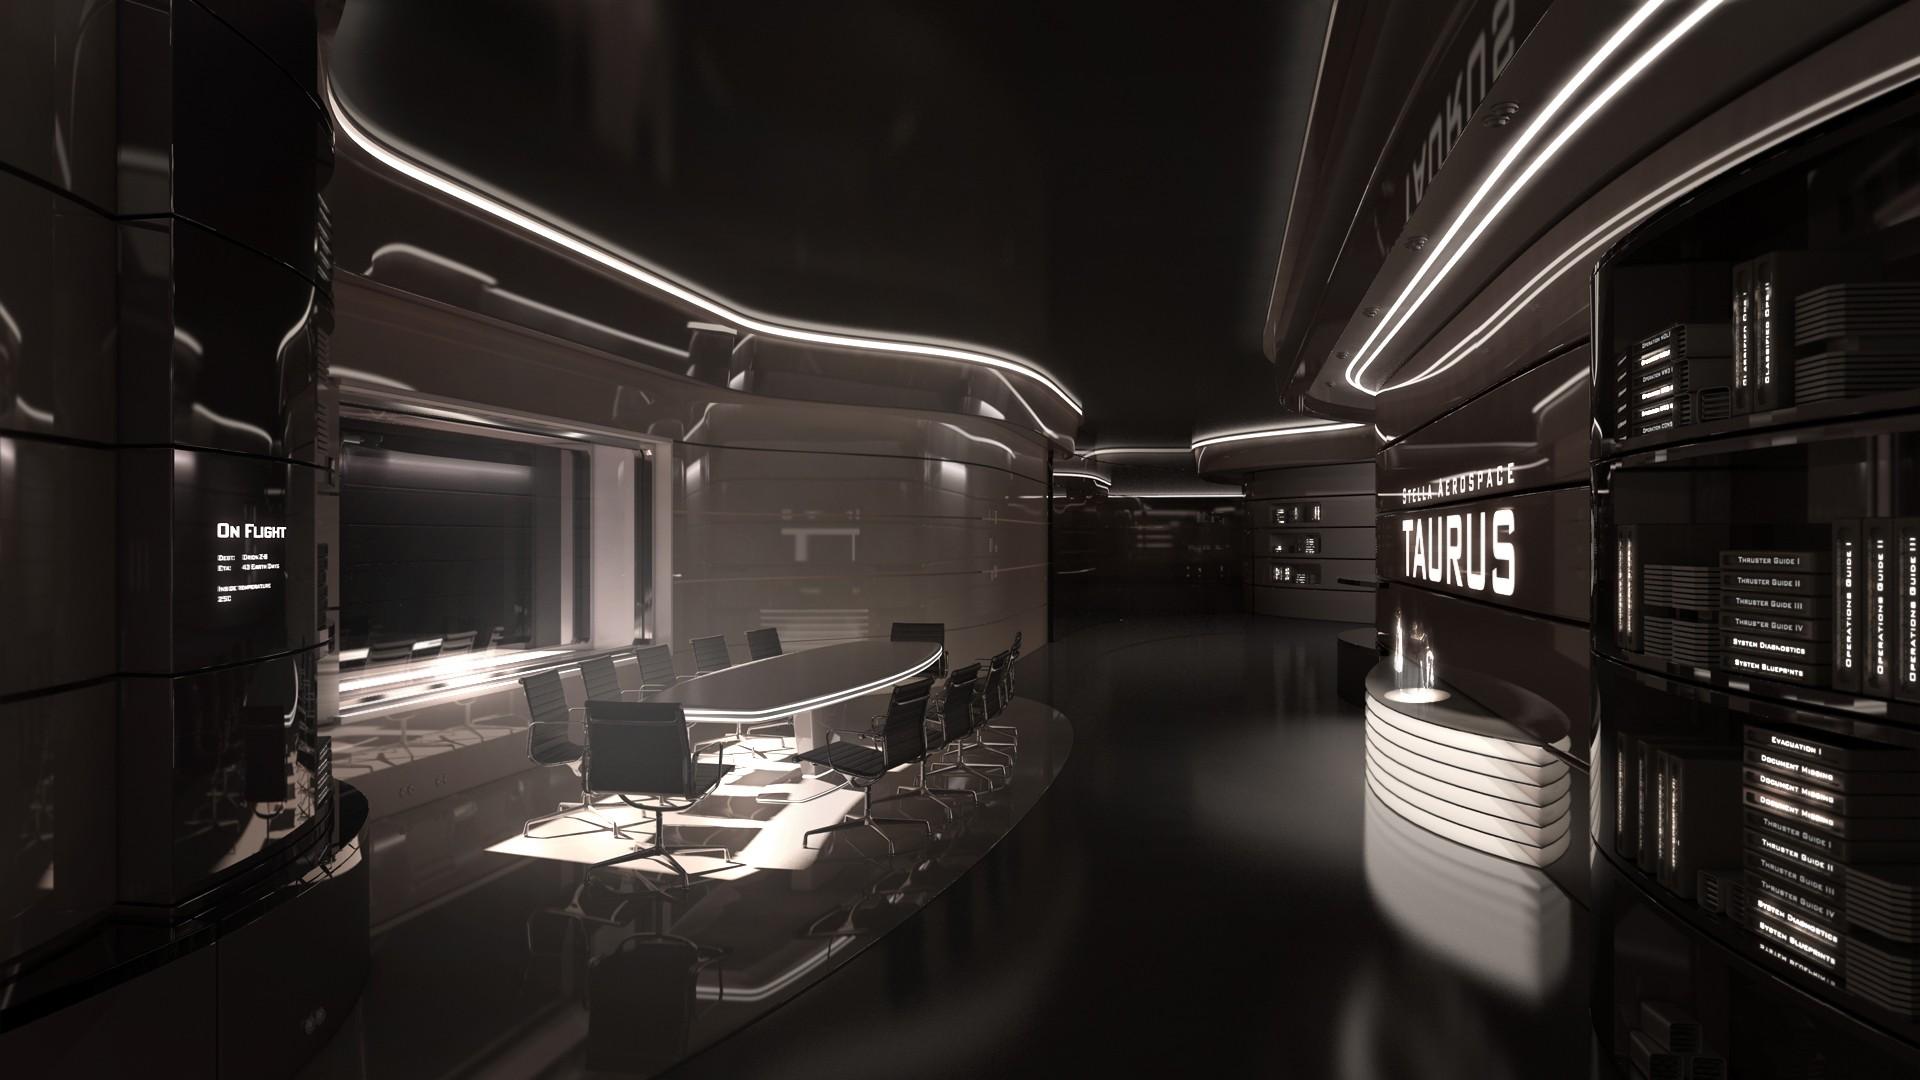 Fondos de pantalla habitaci n futurista moderno - Space wallpaper room ...